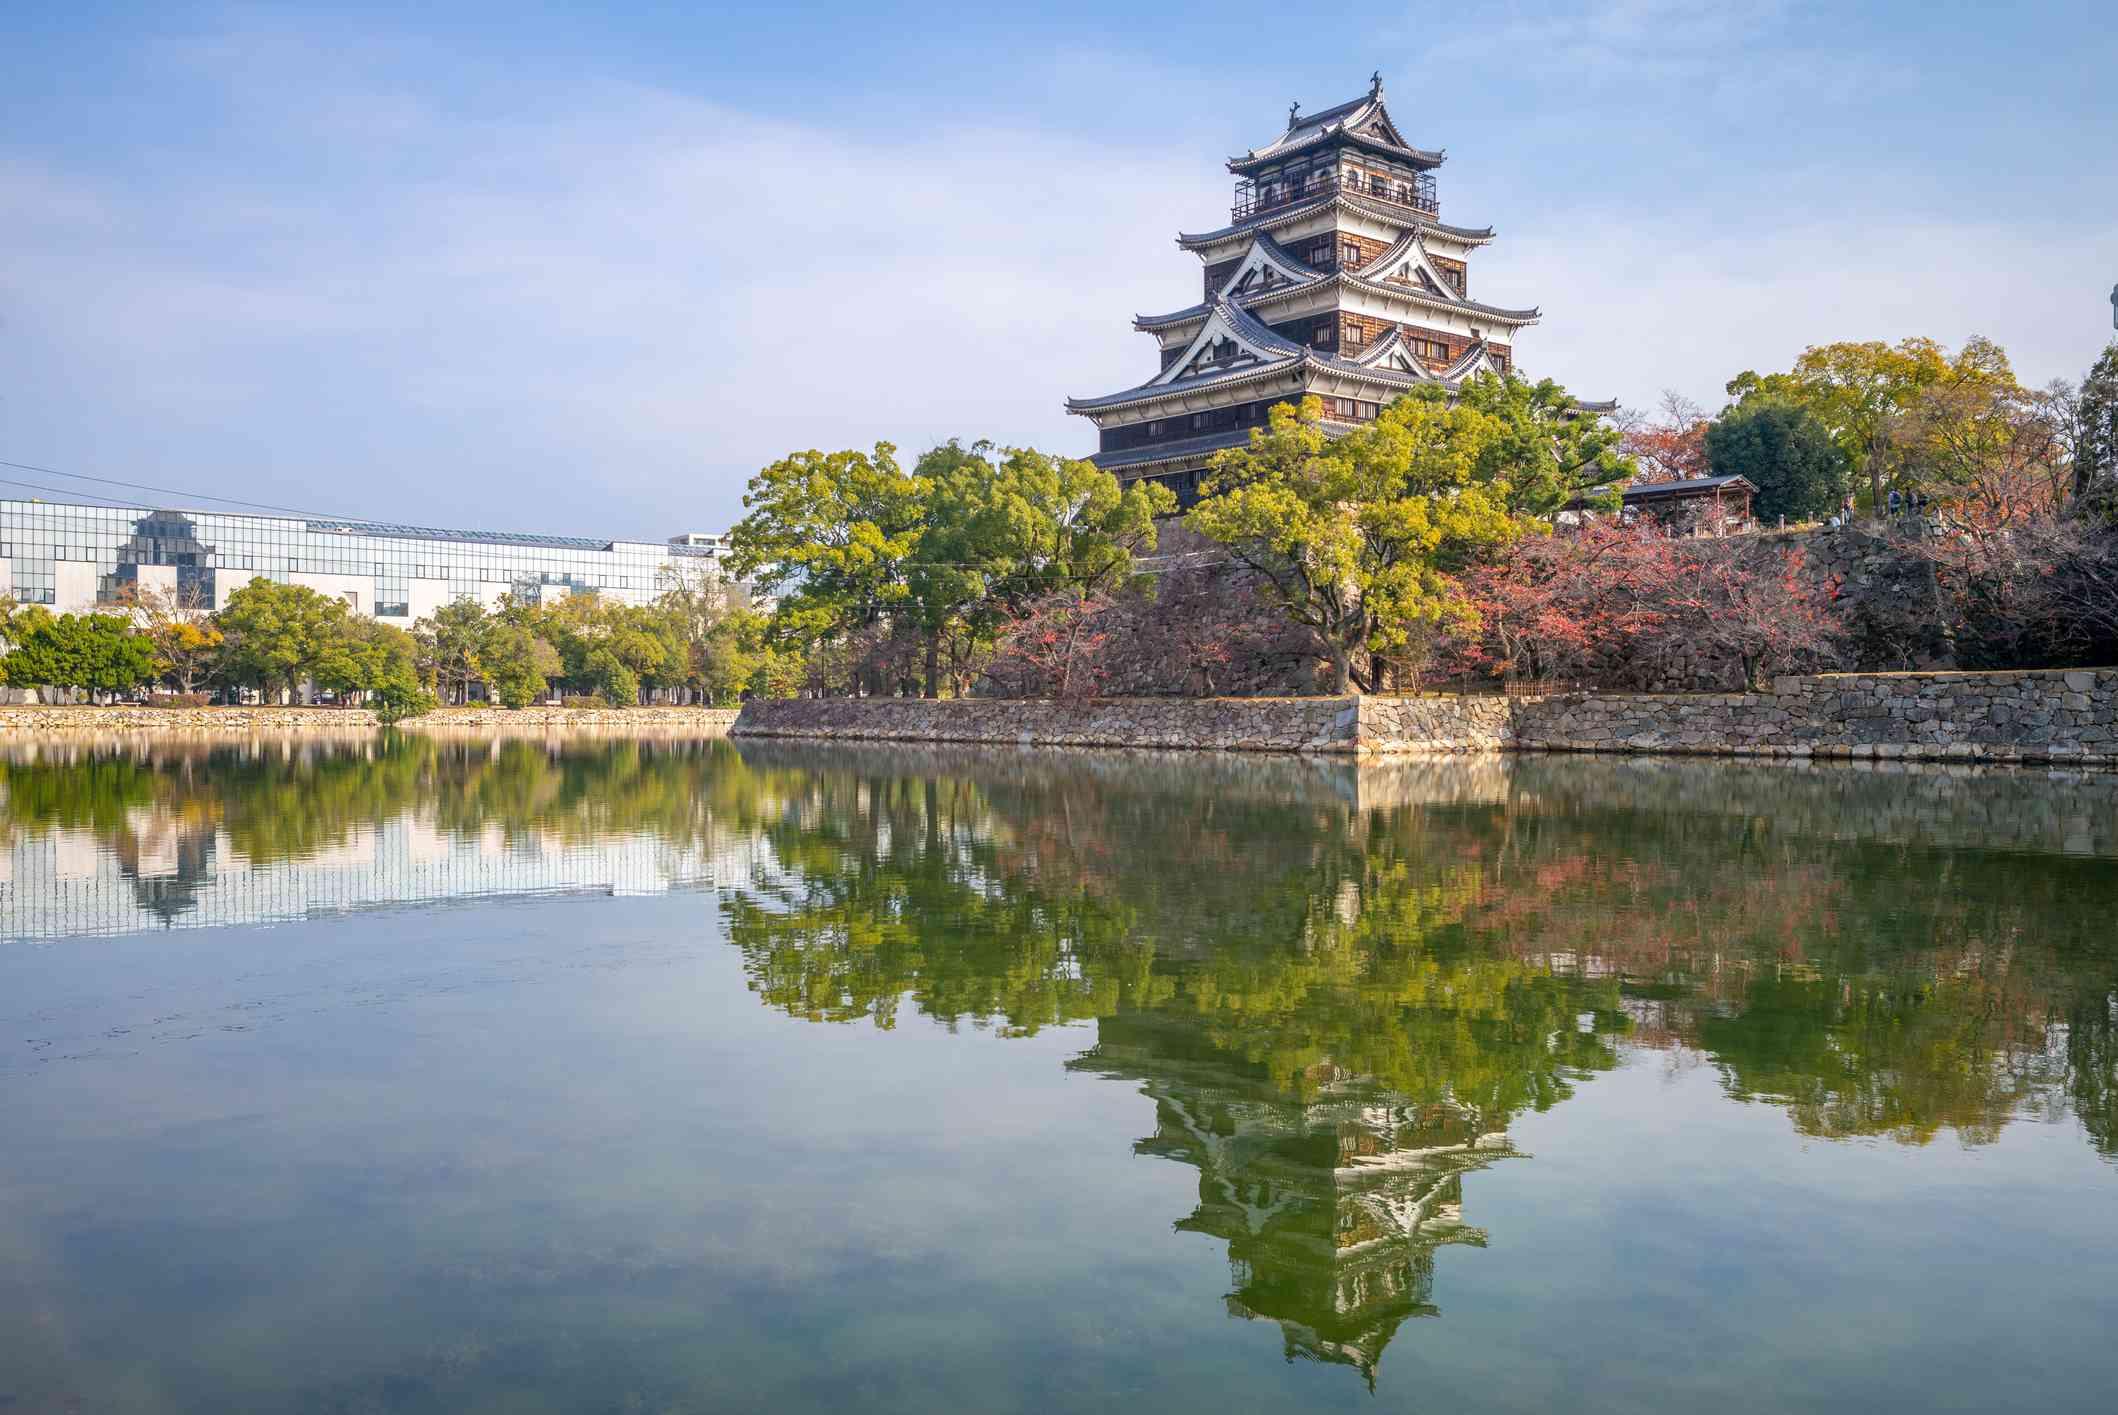 Hiroshima Castle (Carp Castle) and a reflection pool in Hiroshima, Japan